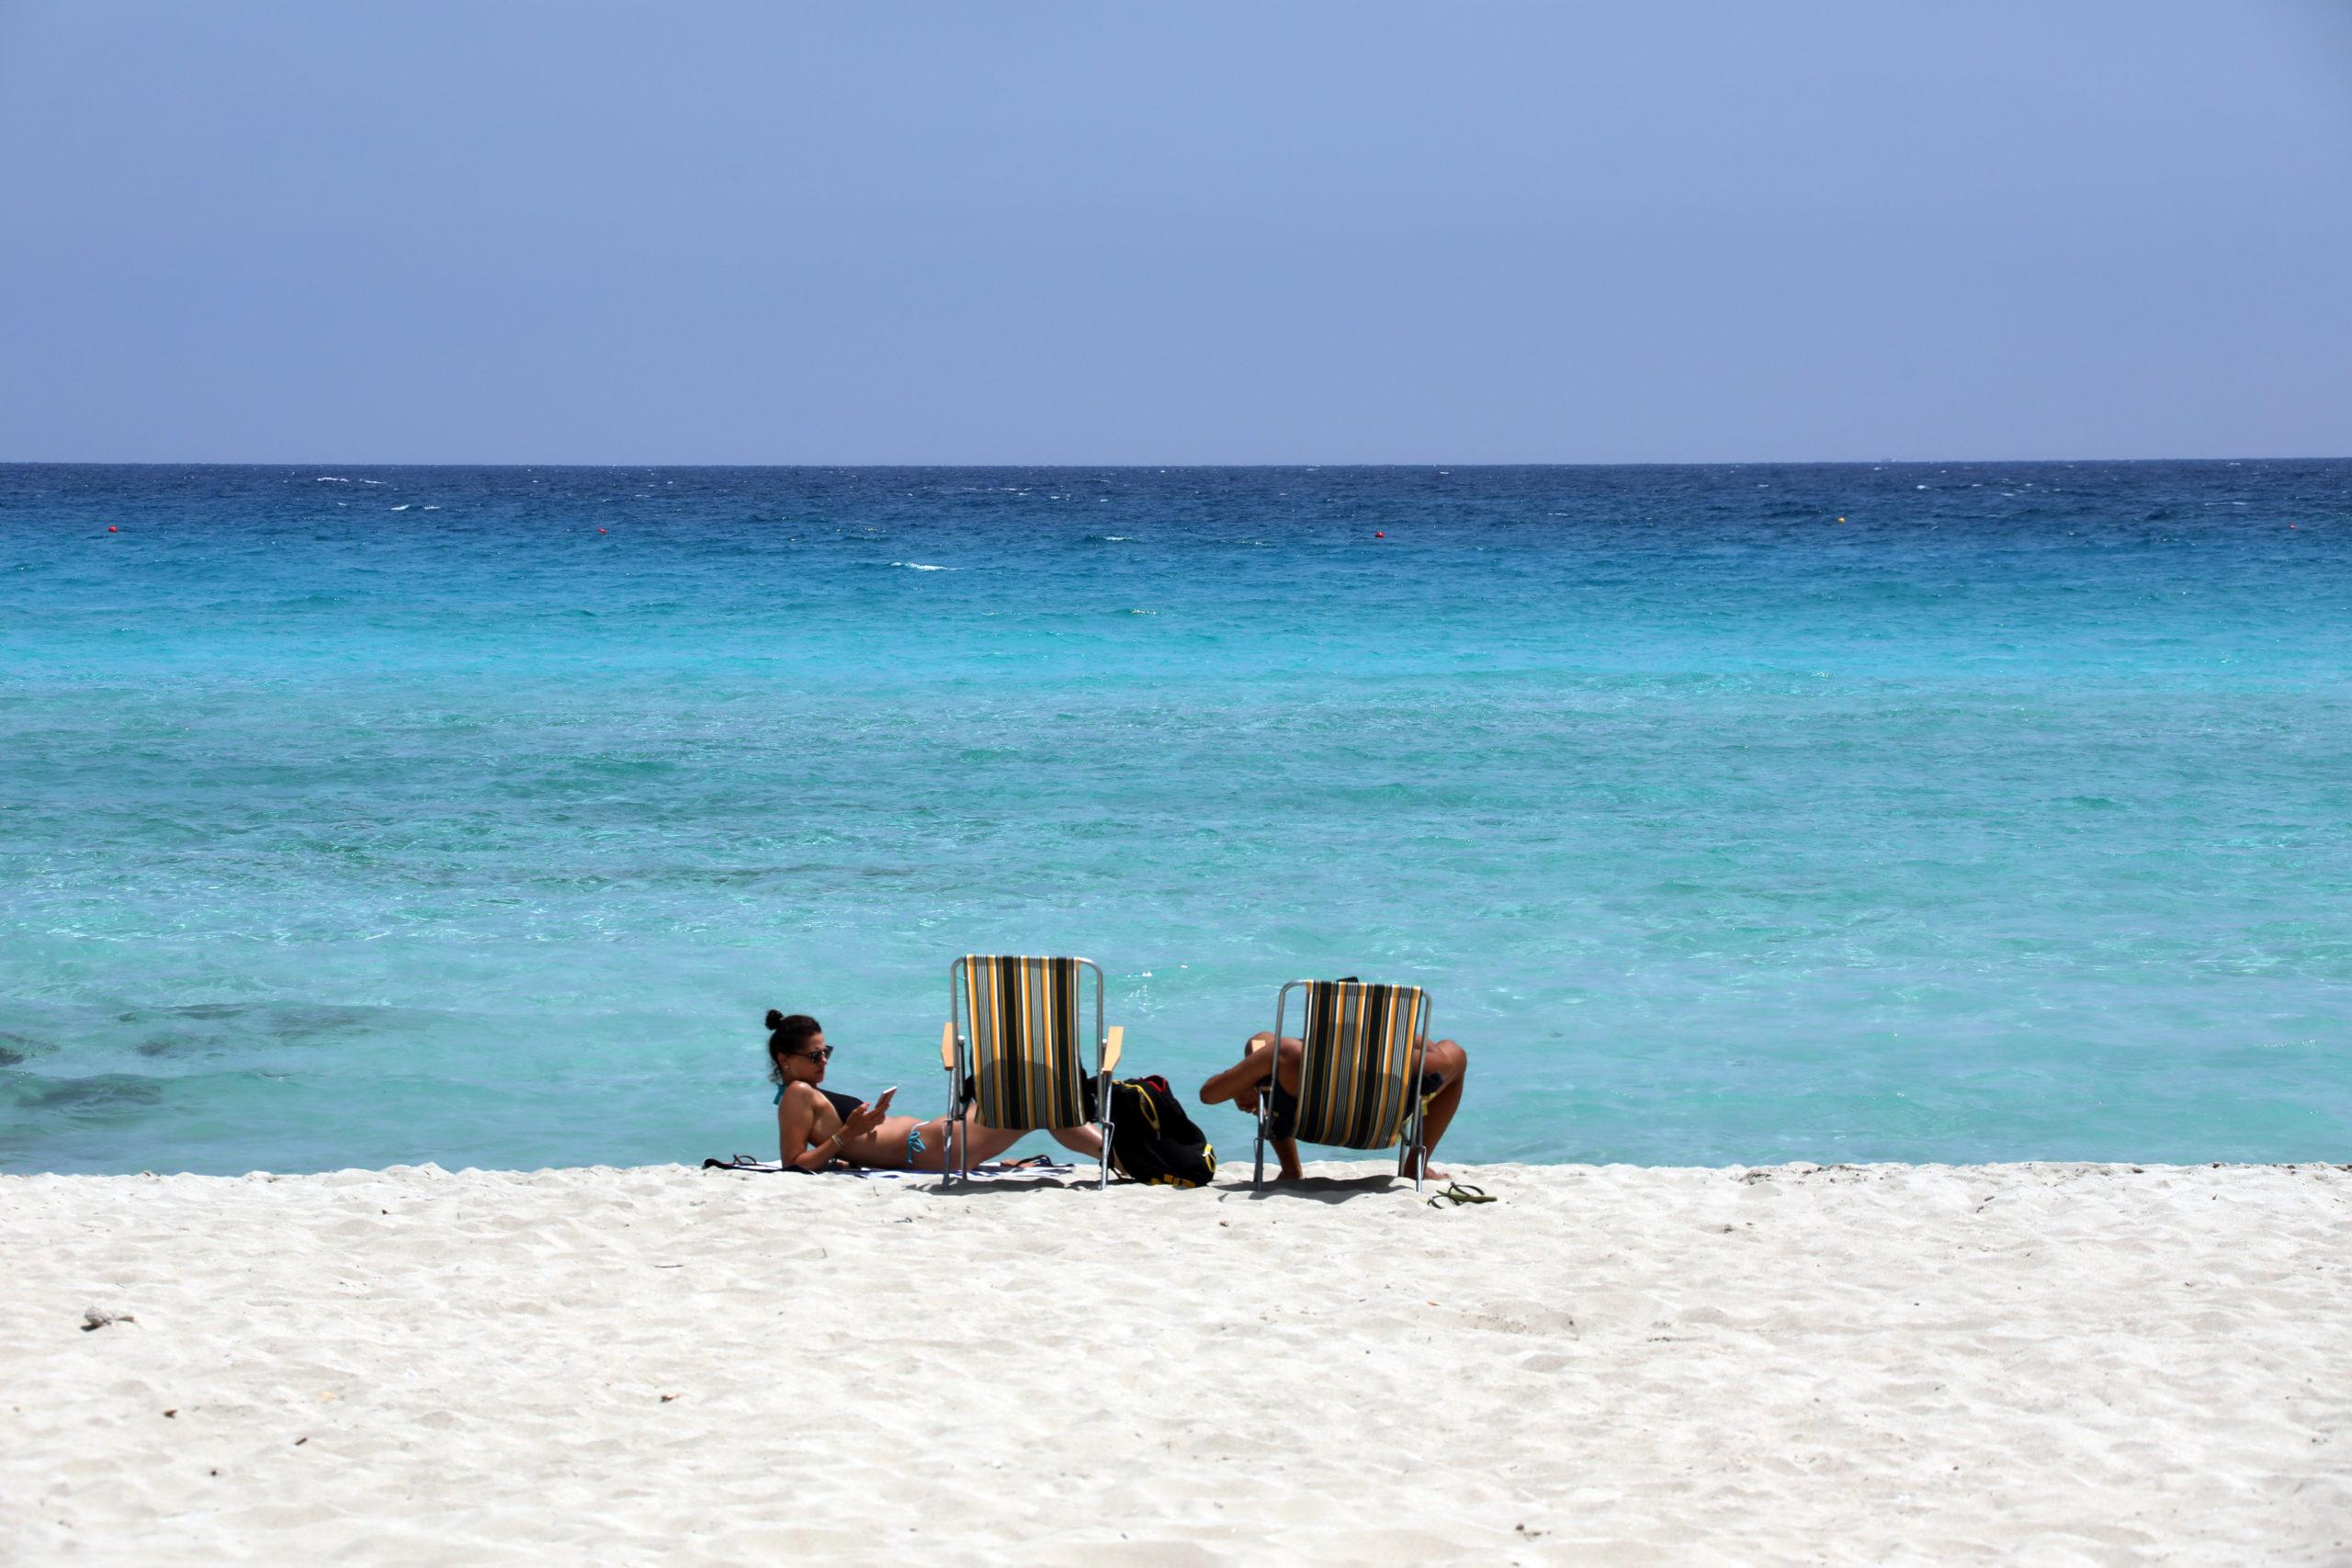 Cyprus tourist arrivals slump 81.2% in August